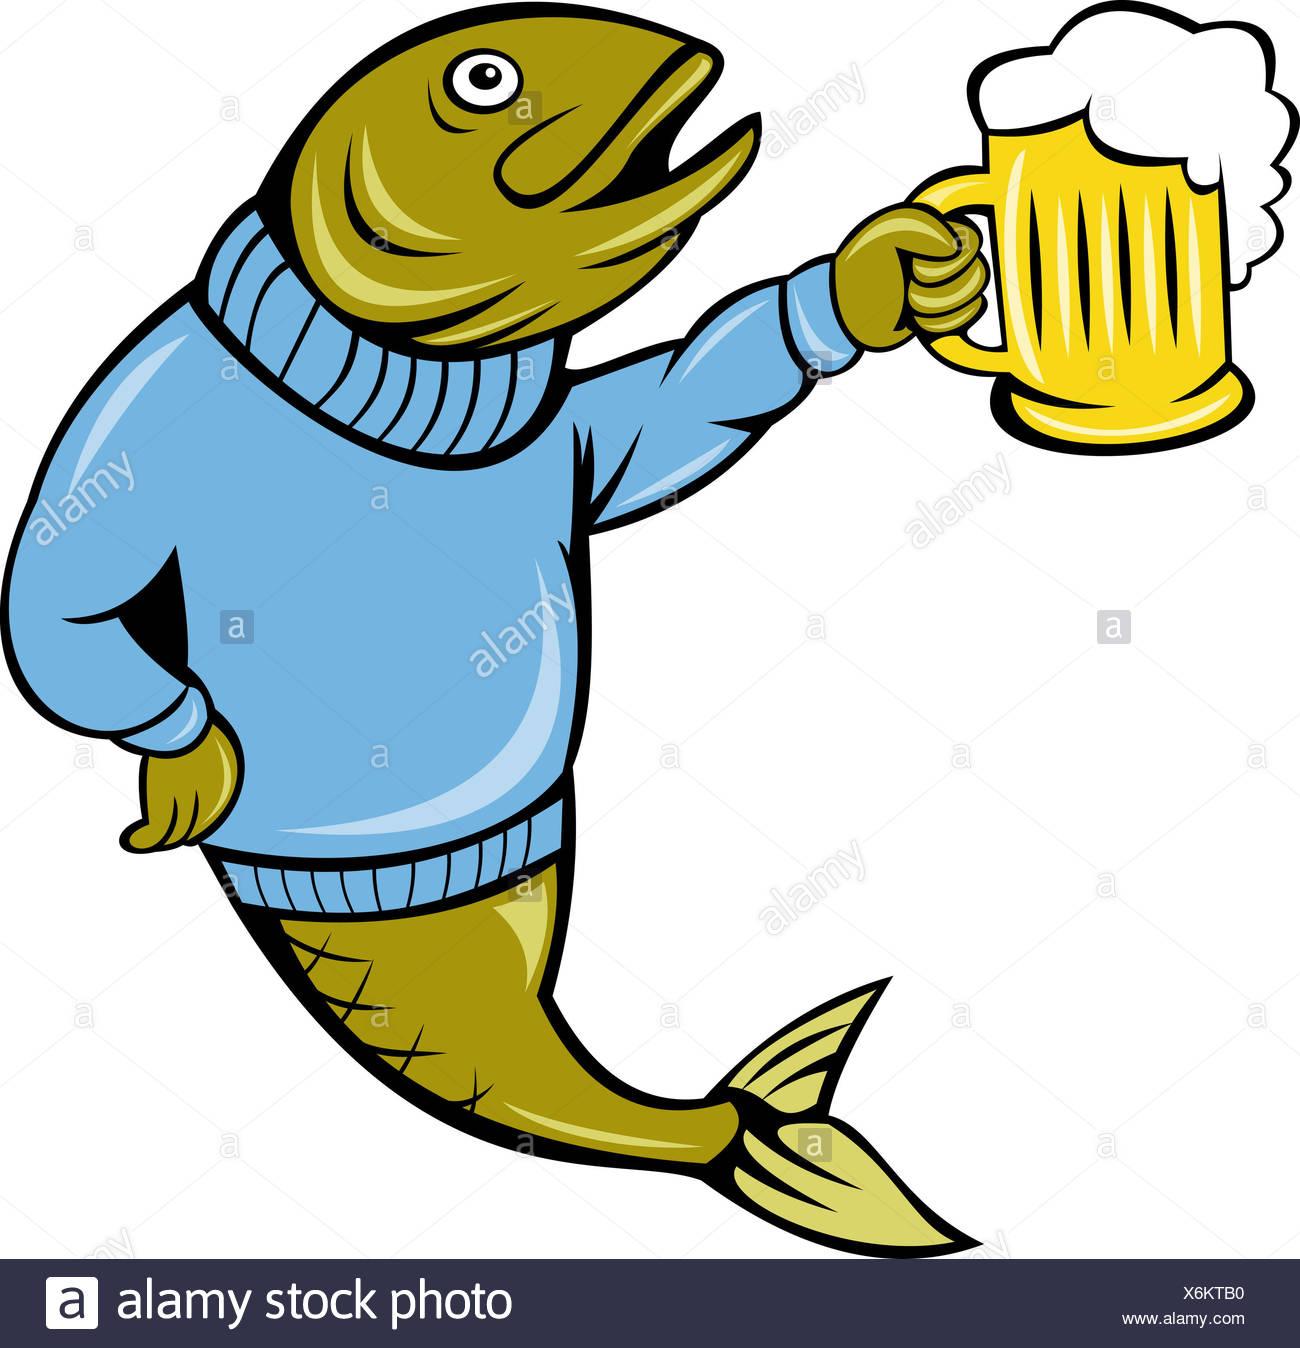 drink drinking bibs fish beer bottle herring cartoon lager drink